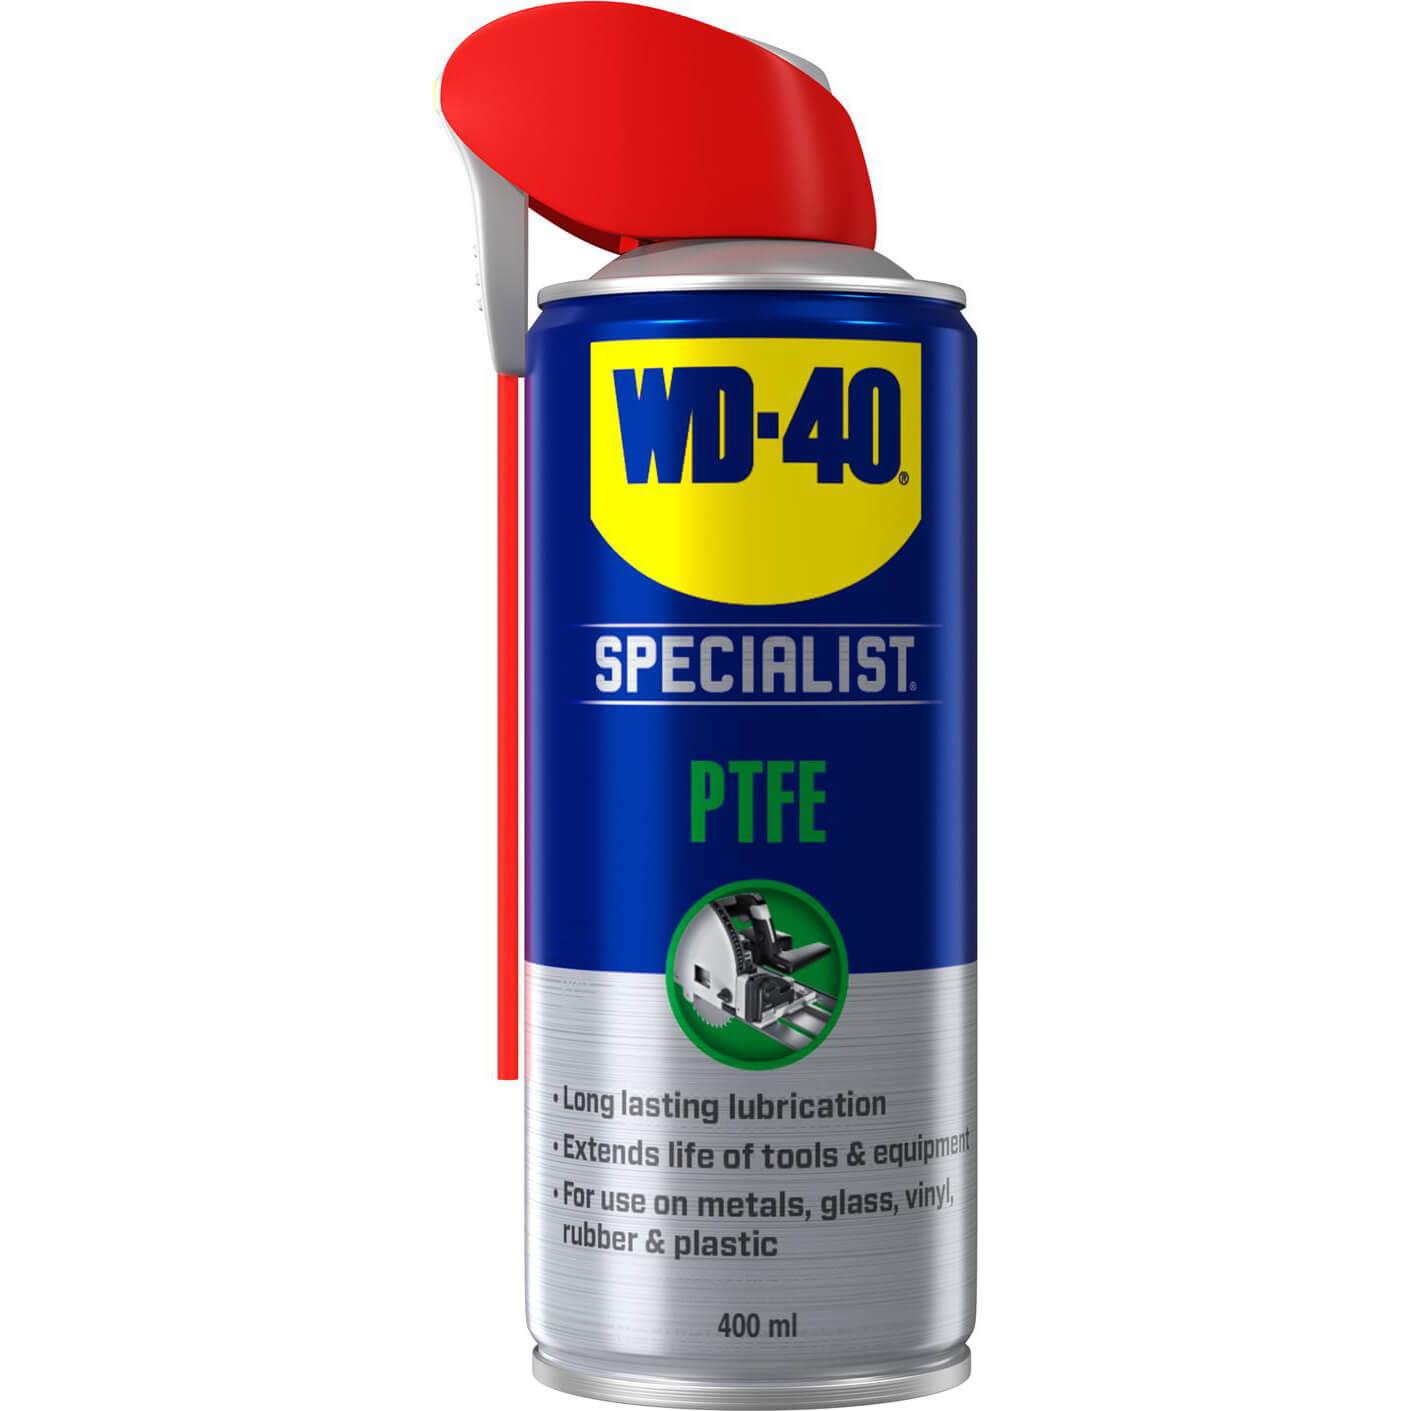 Image of WD40 Specialist High Performance PTFE Lubricant Aerosol Spray 400ml